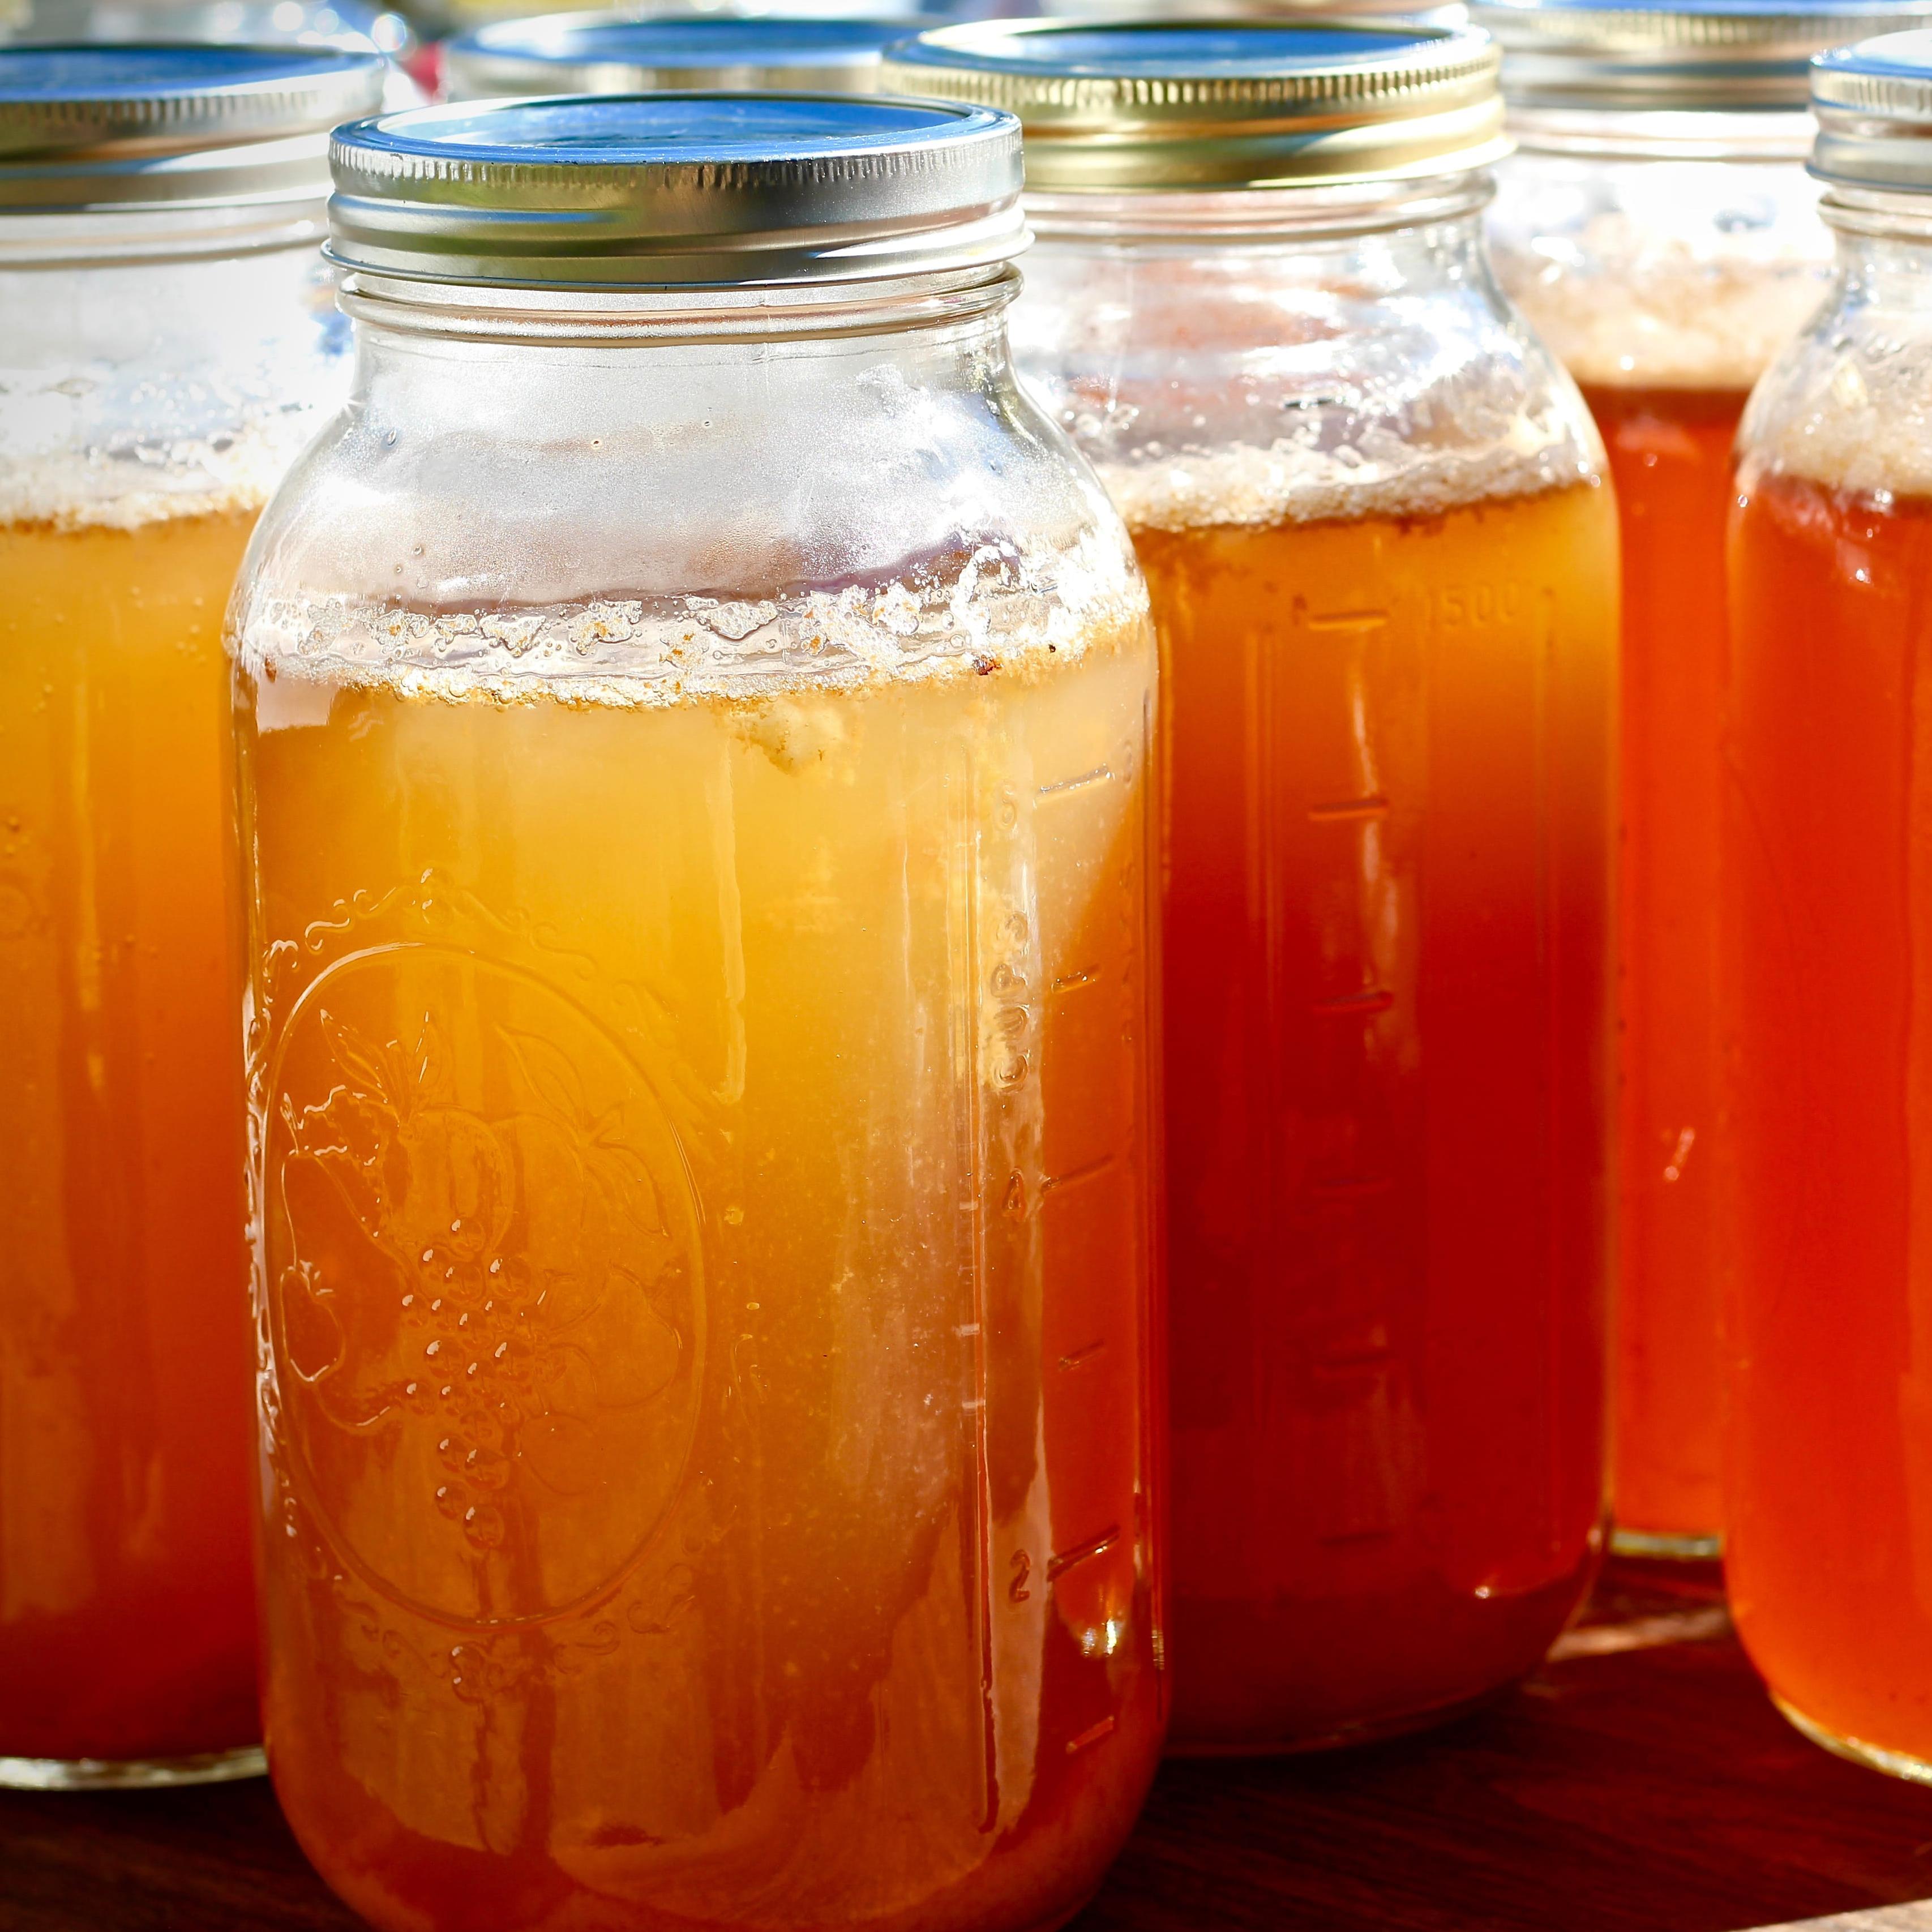 canning jars filled with apple cider